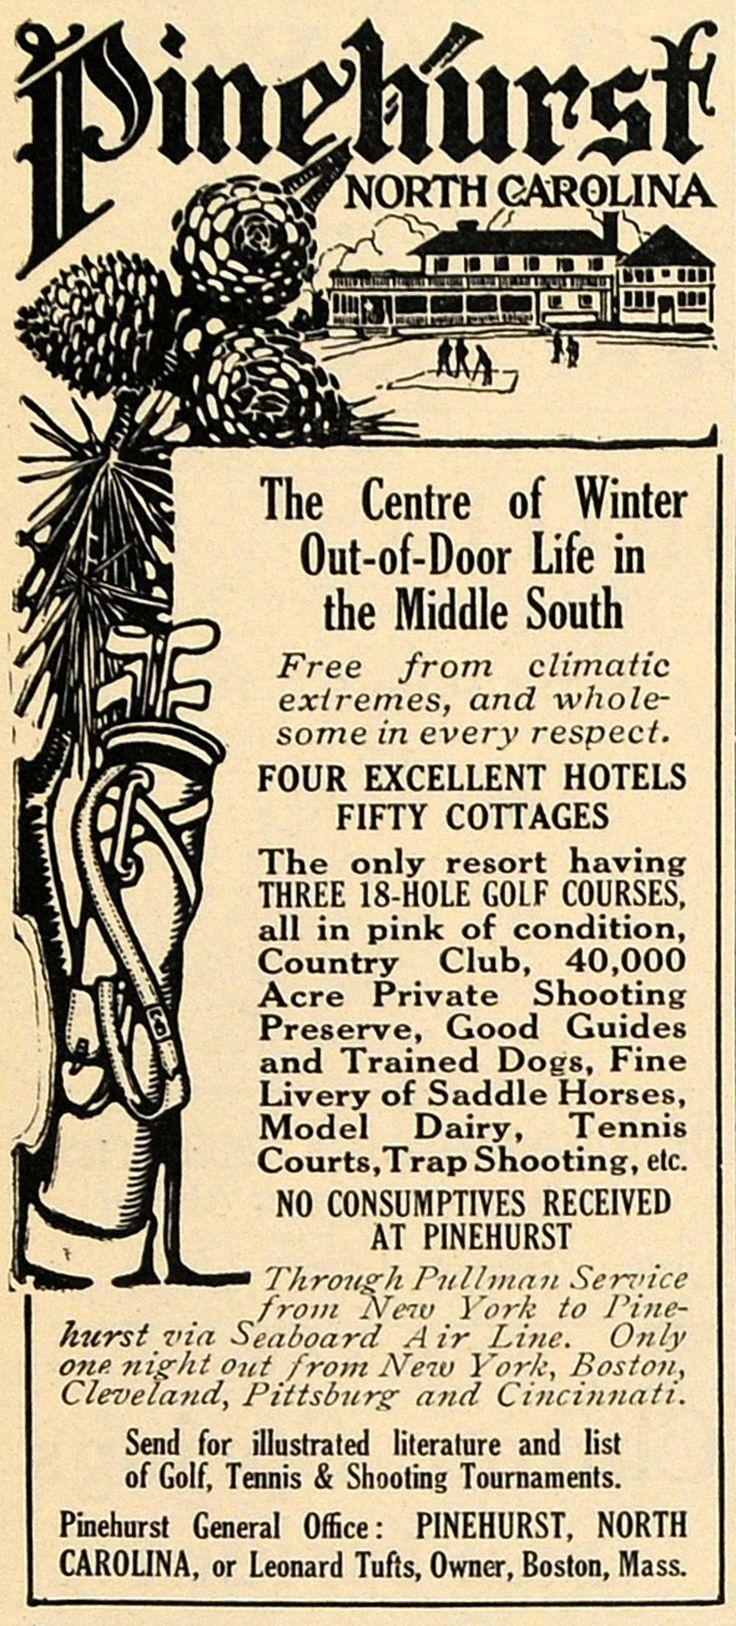 1911 Ad Pinehurst Resort Golf Country Club Horse Dogs - ORIGINAL TOM1